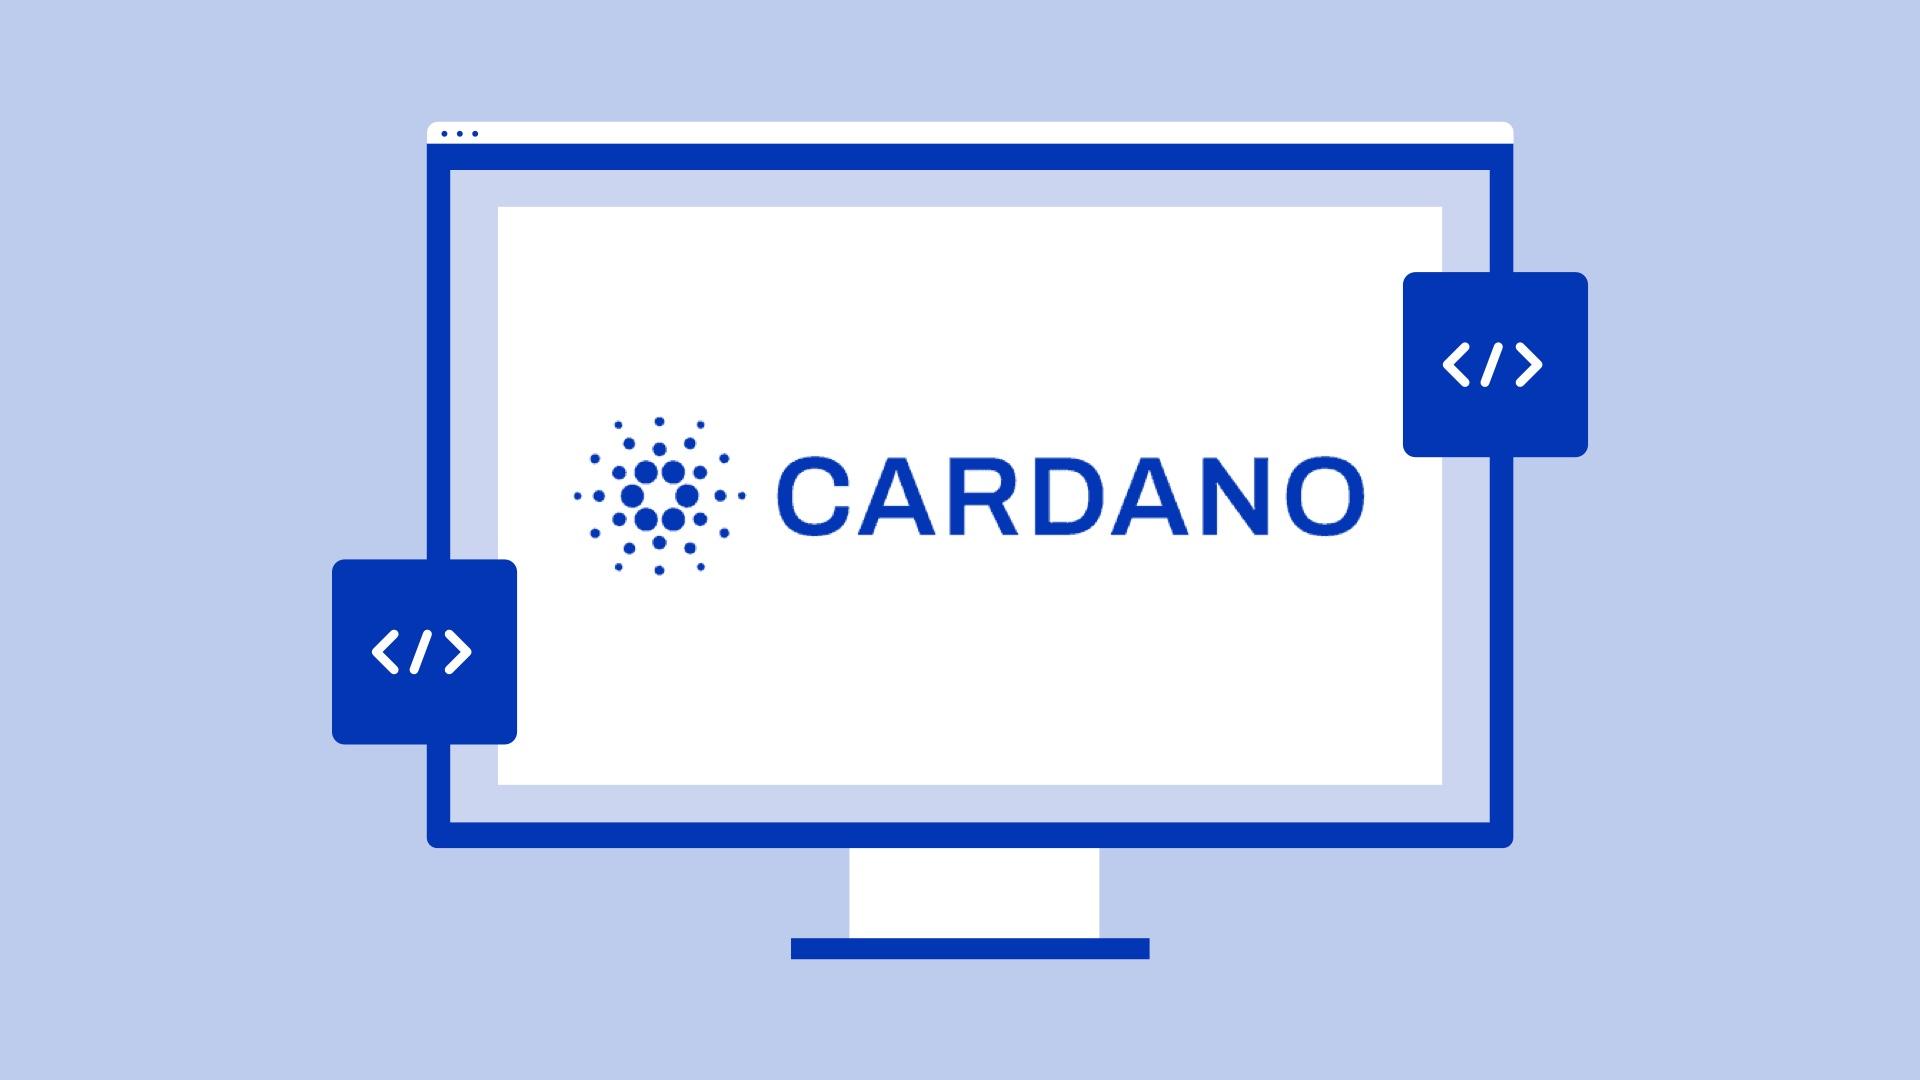 Cardano: An Ethereum Killer?